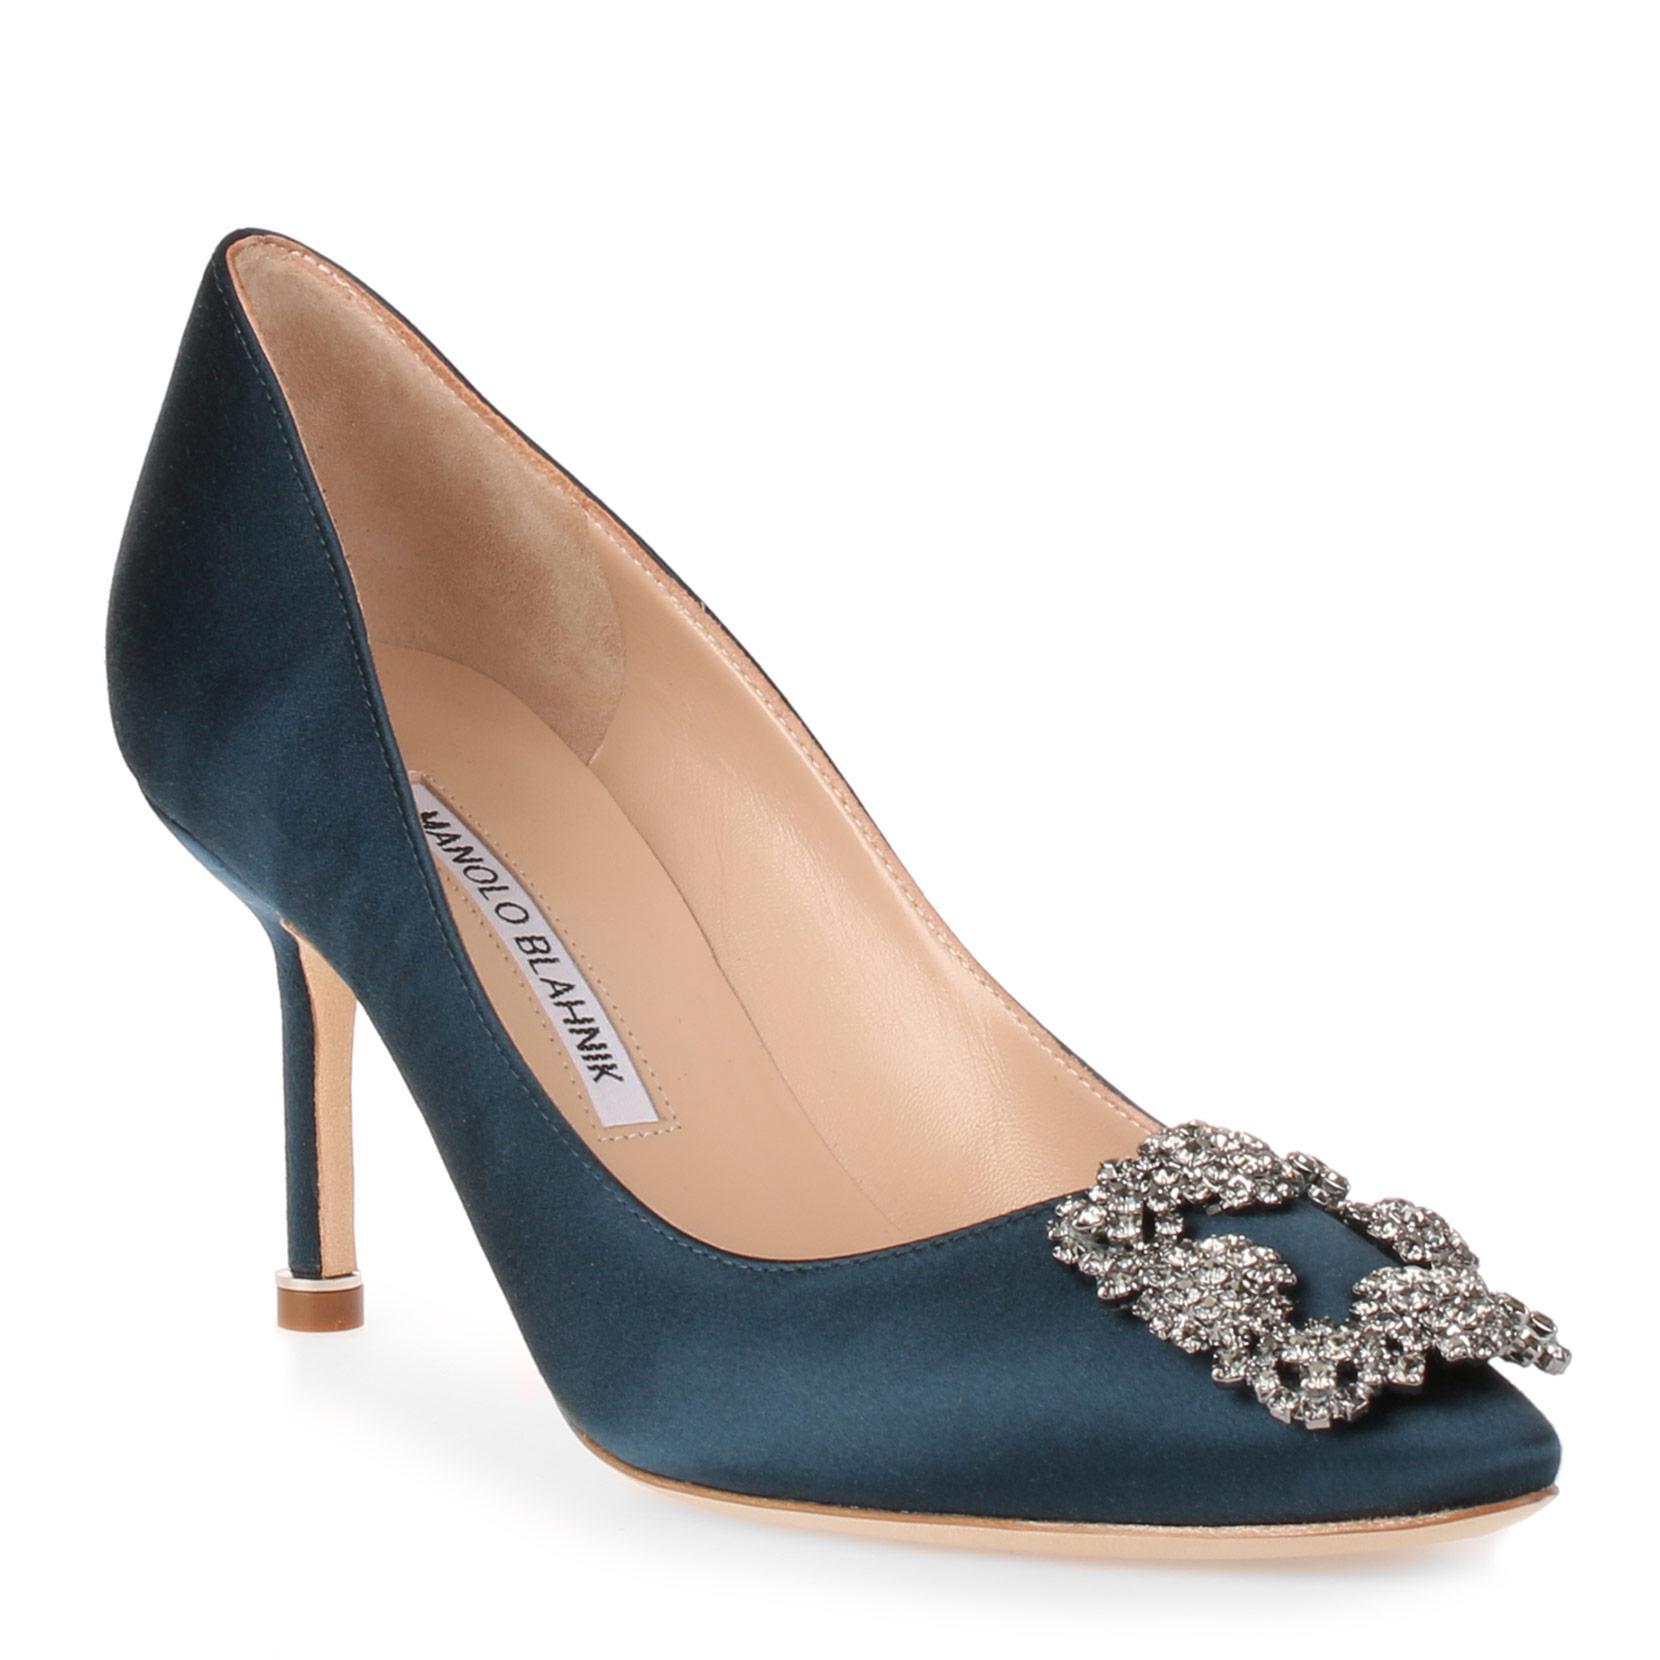 Manolo Blahnik Satin Buckle-Accented Pumps fashion Style cheap price original online sale cheap price t6gbBKz